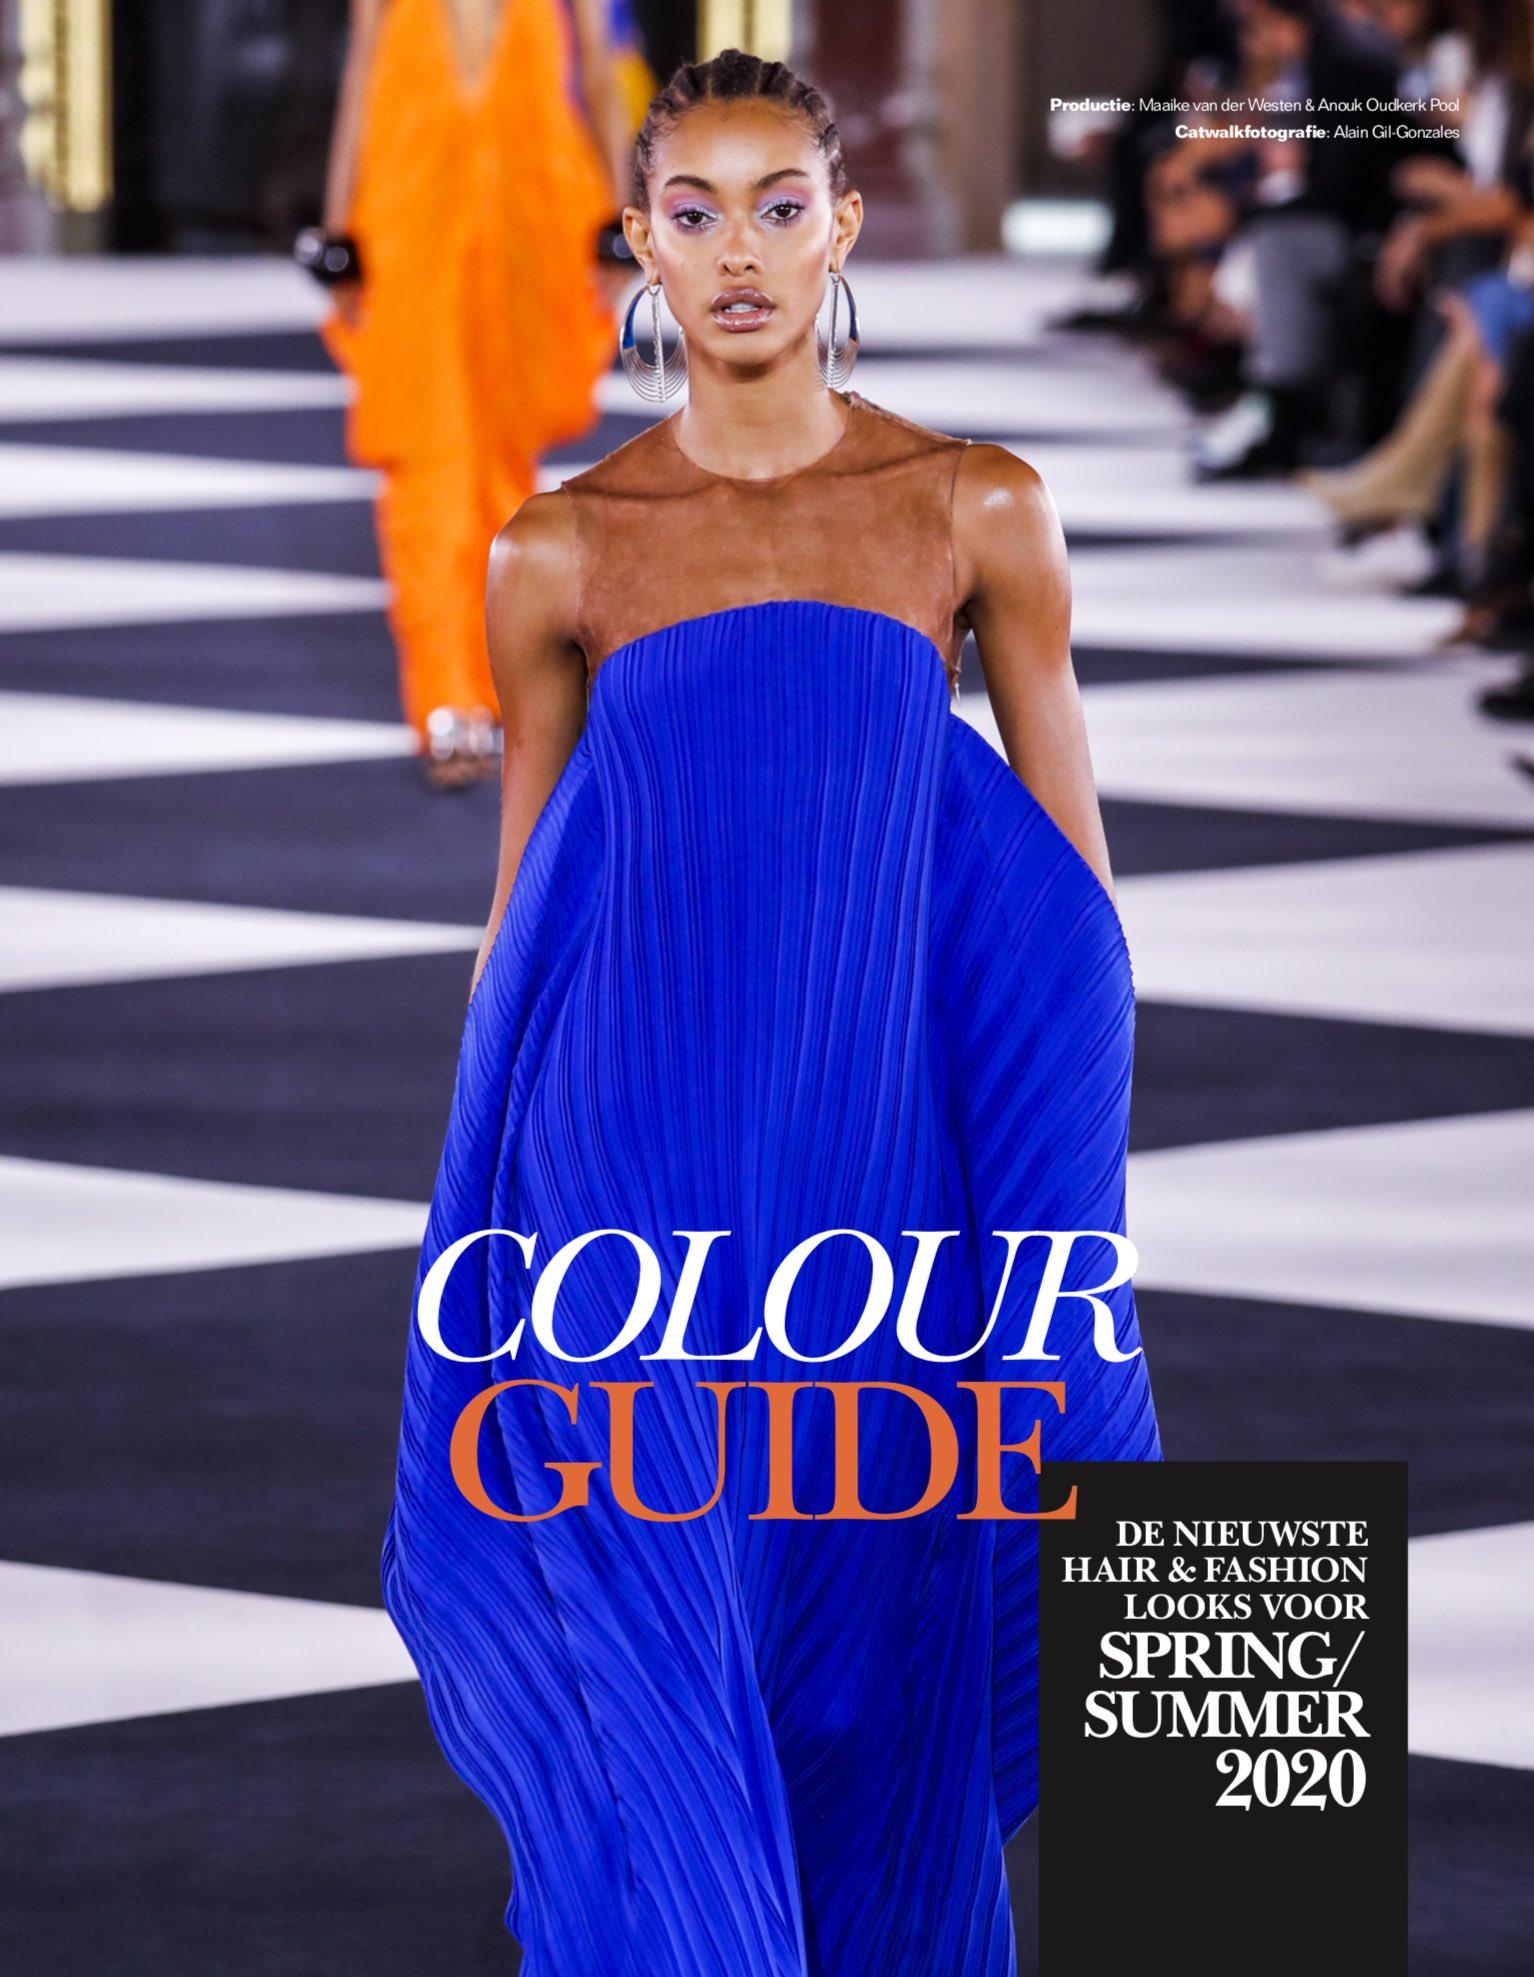 Colour Guide S/S 20